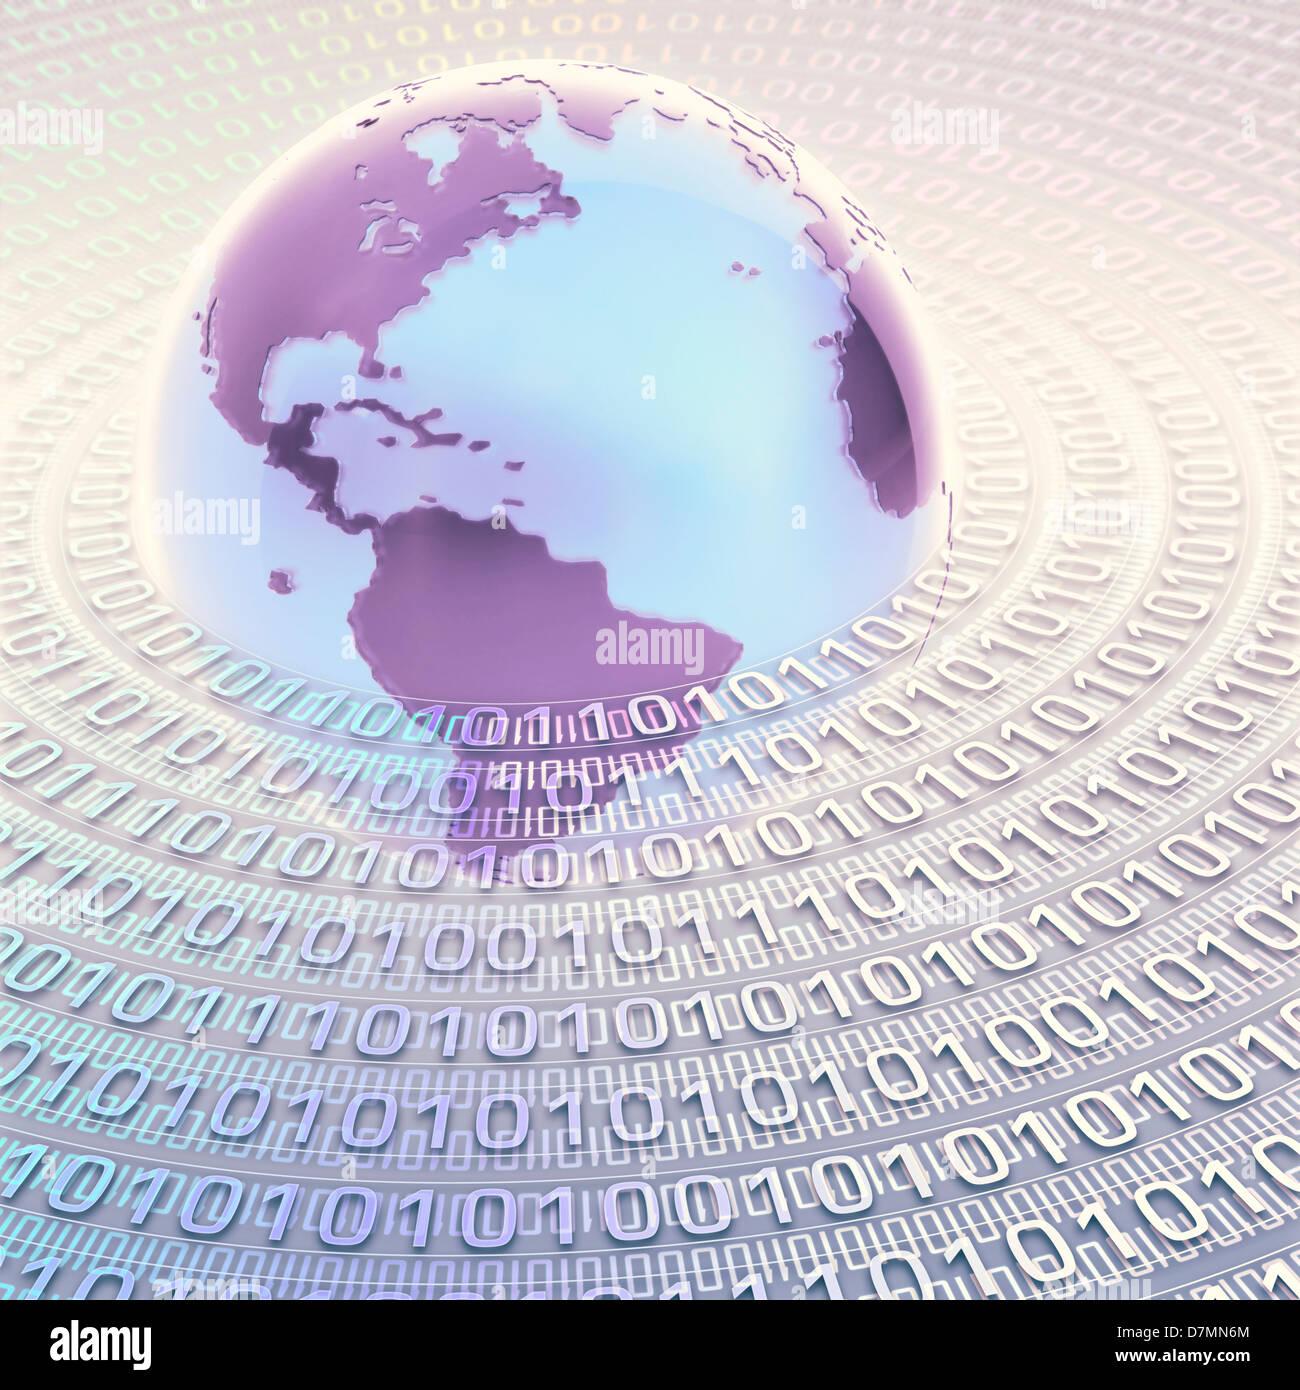 Digital world, conceptual artwork - Stock Image